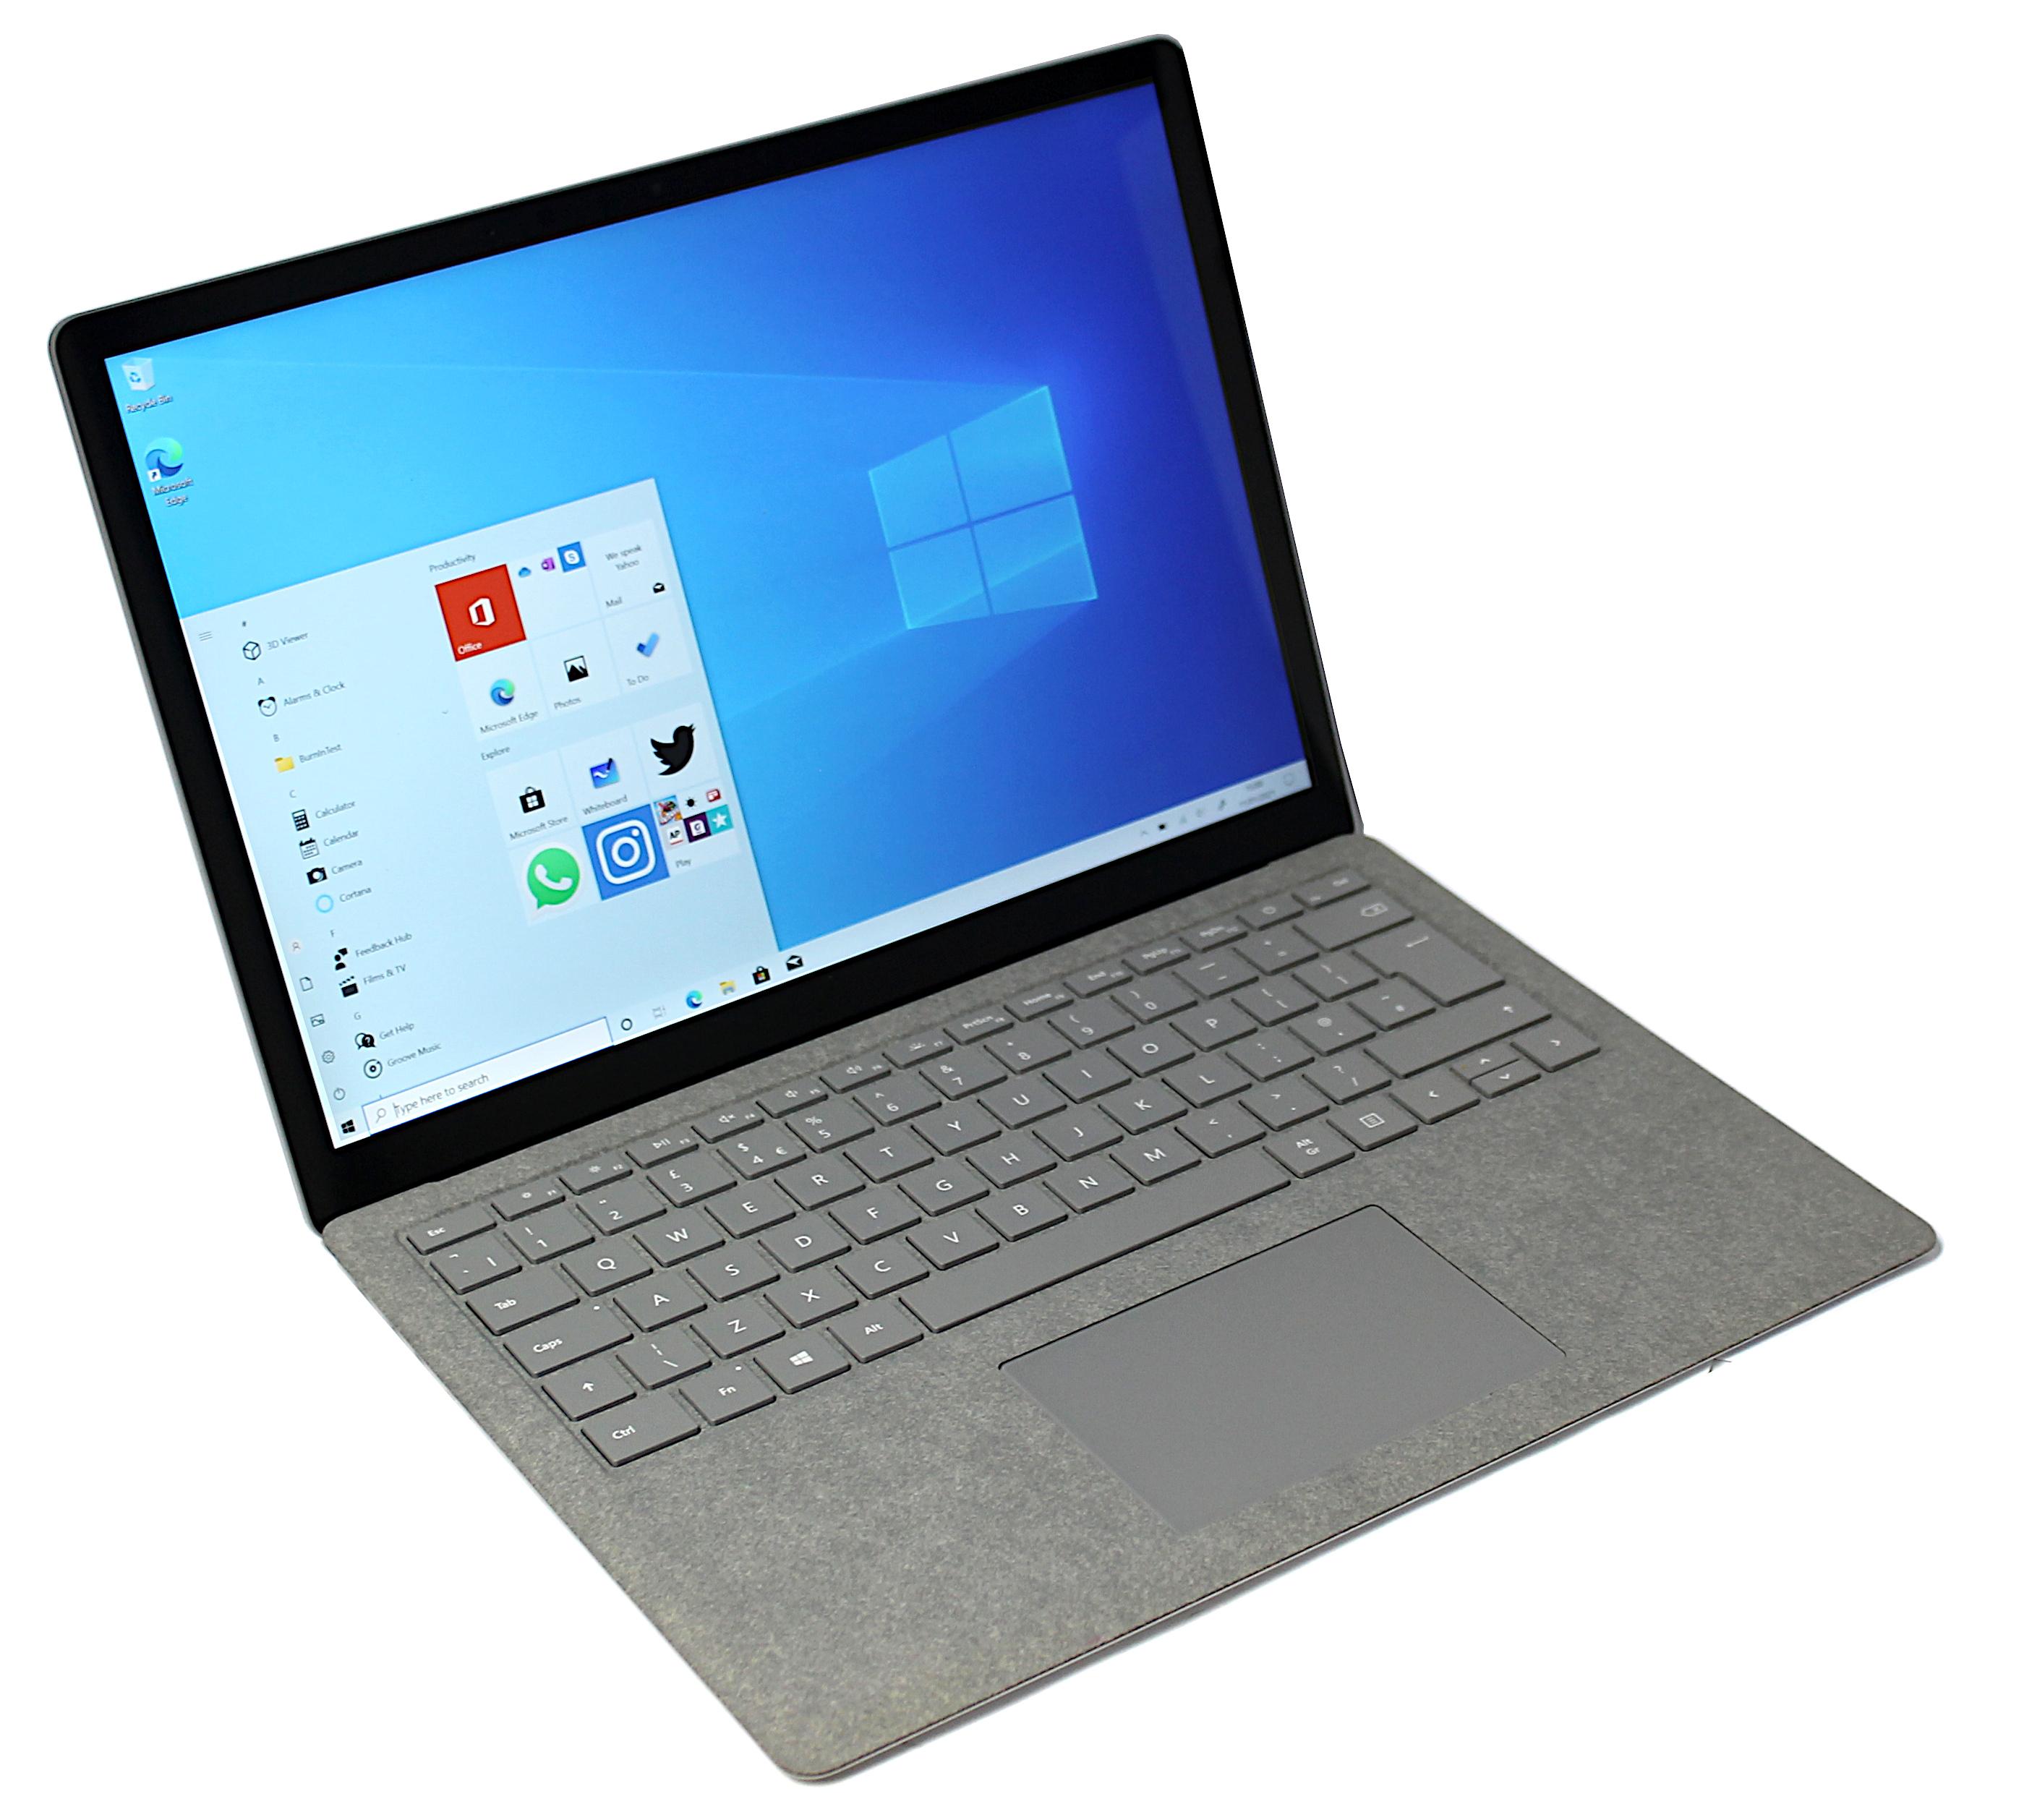 Microsoft Surface Laptop 2 - M1769 i5-8250U 8GB RAM 128GB eMMC Grey Win 10 Home